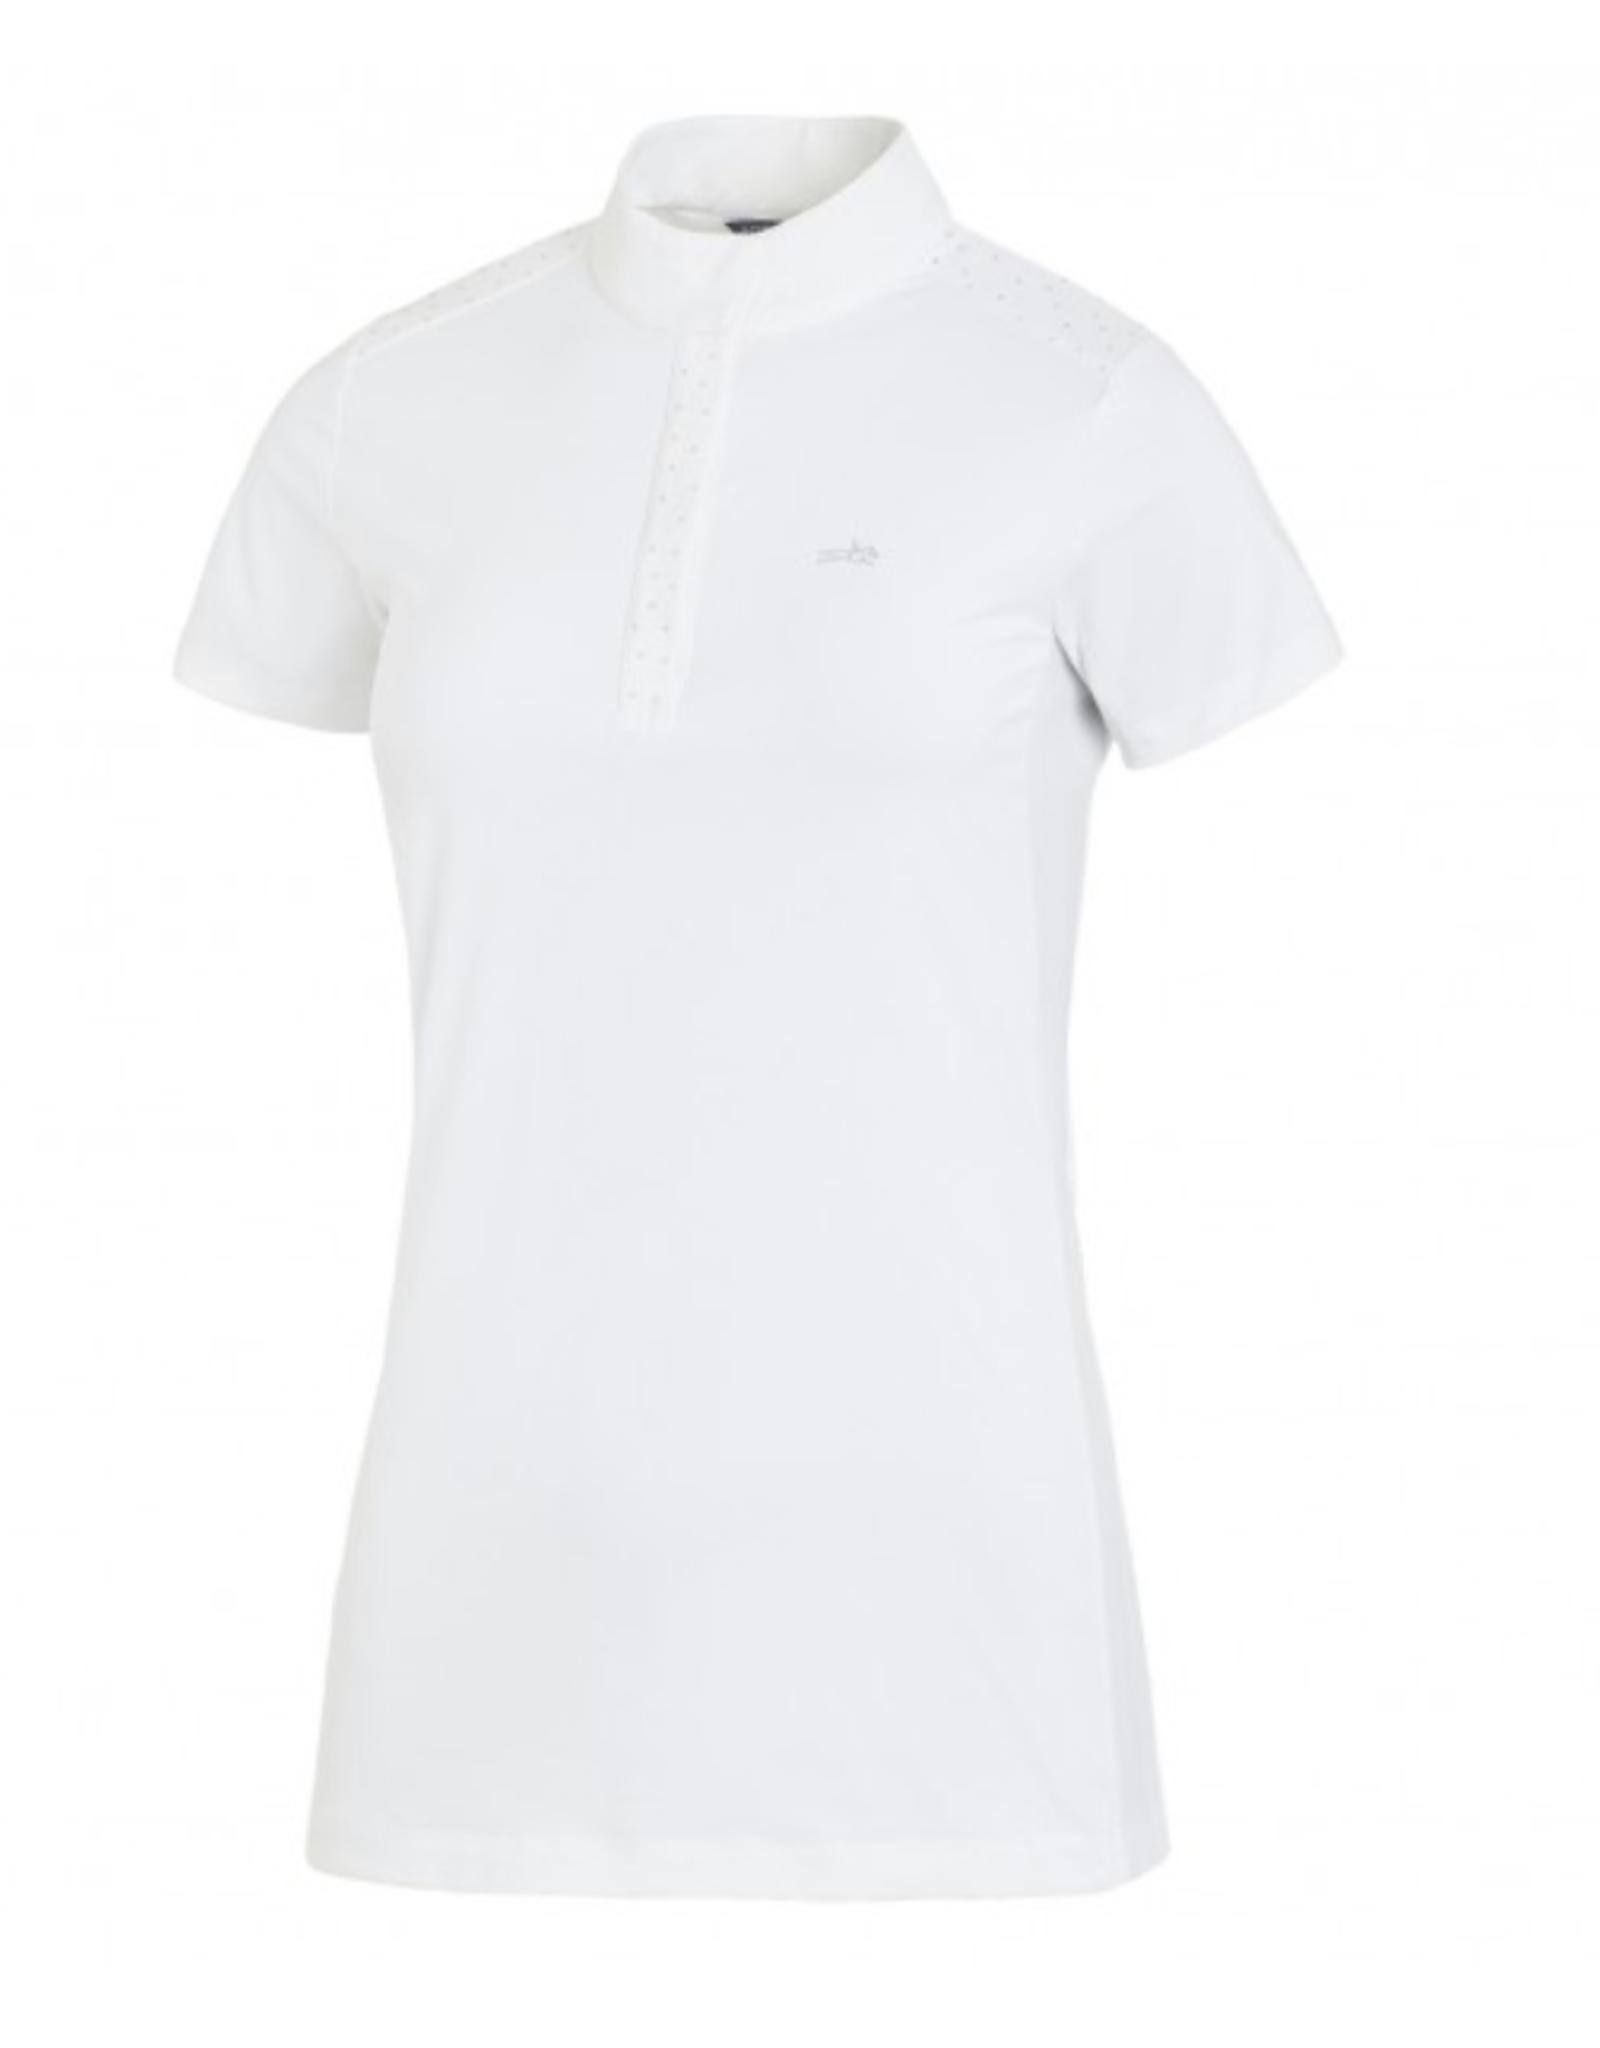 Schockemöhle Ladies' Aylin Shirt